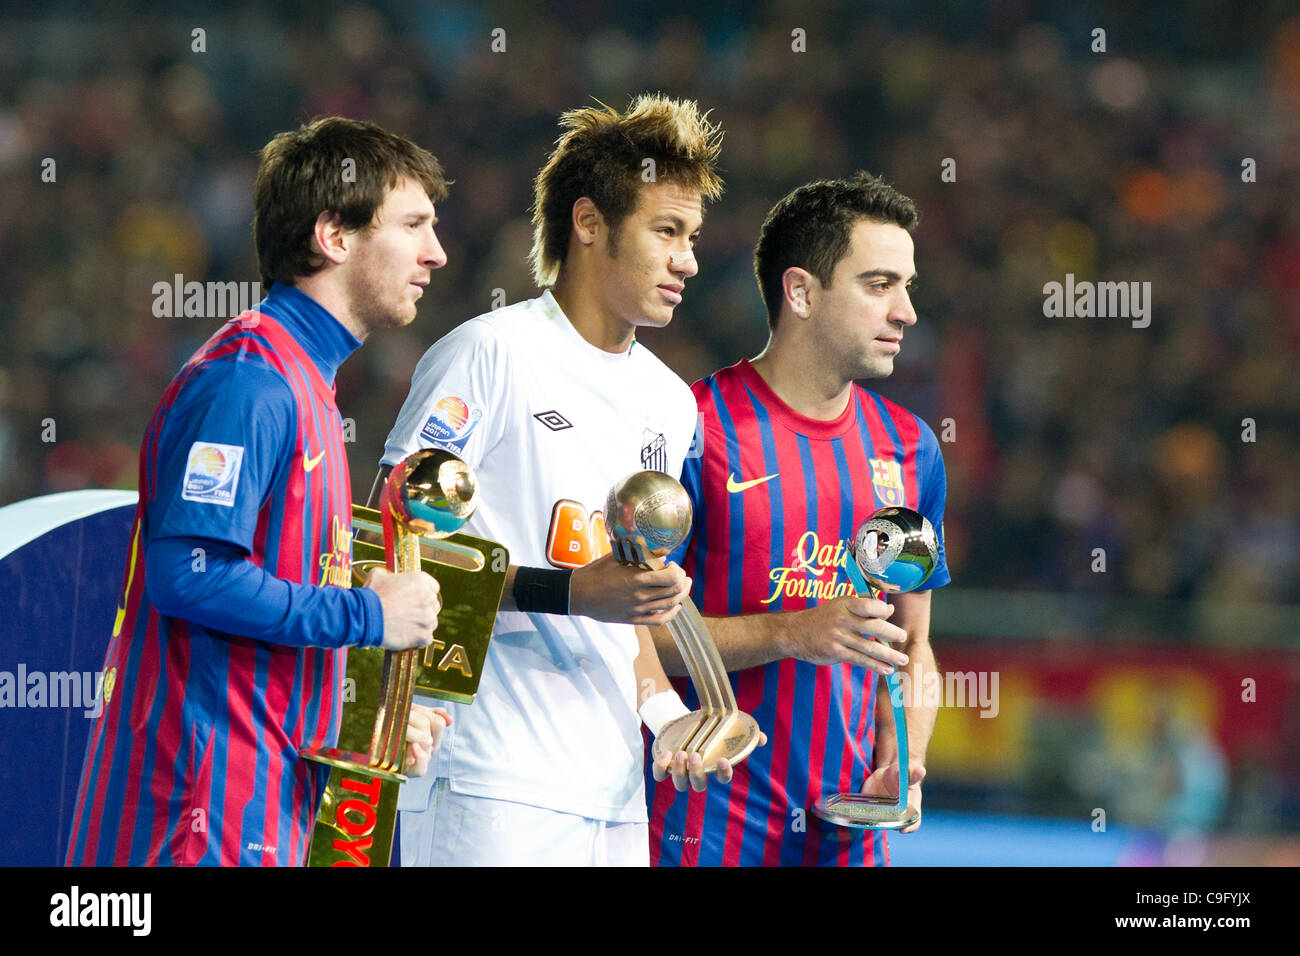 santos l-r barcelona Photo Messi Lionel Stock - Neymar Alamy barcelona Xavi 40303618